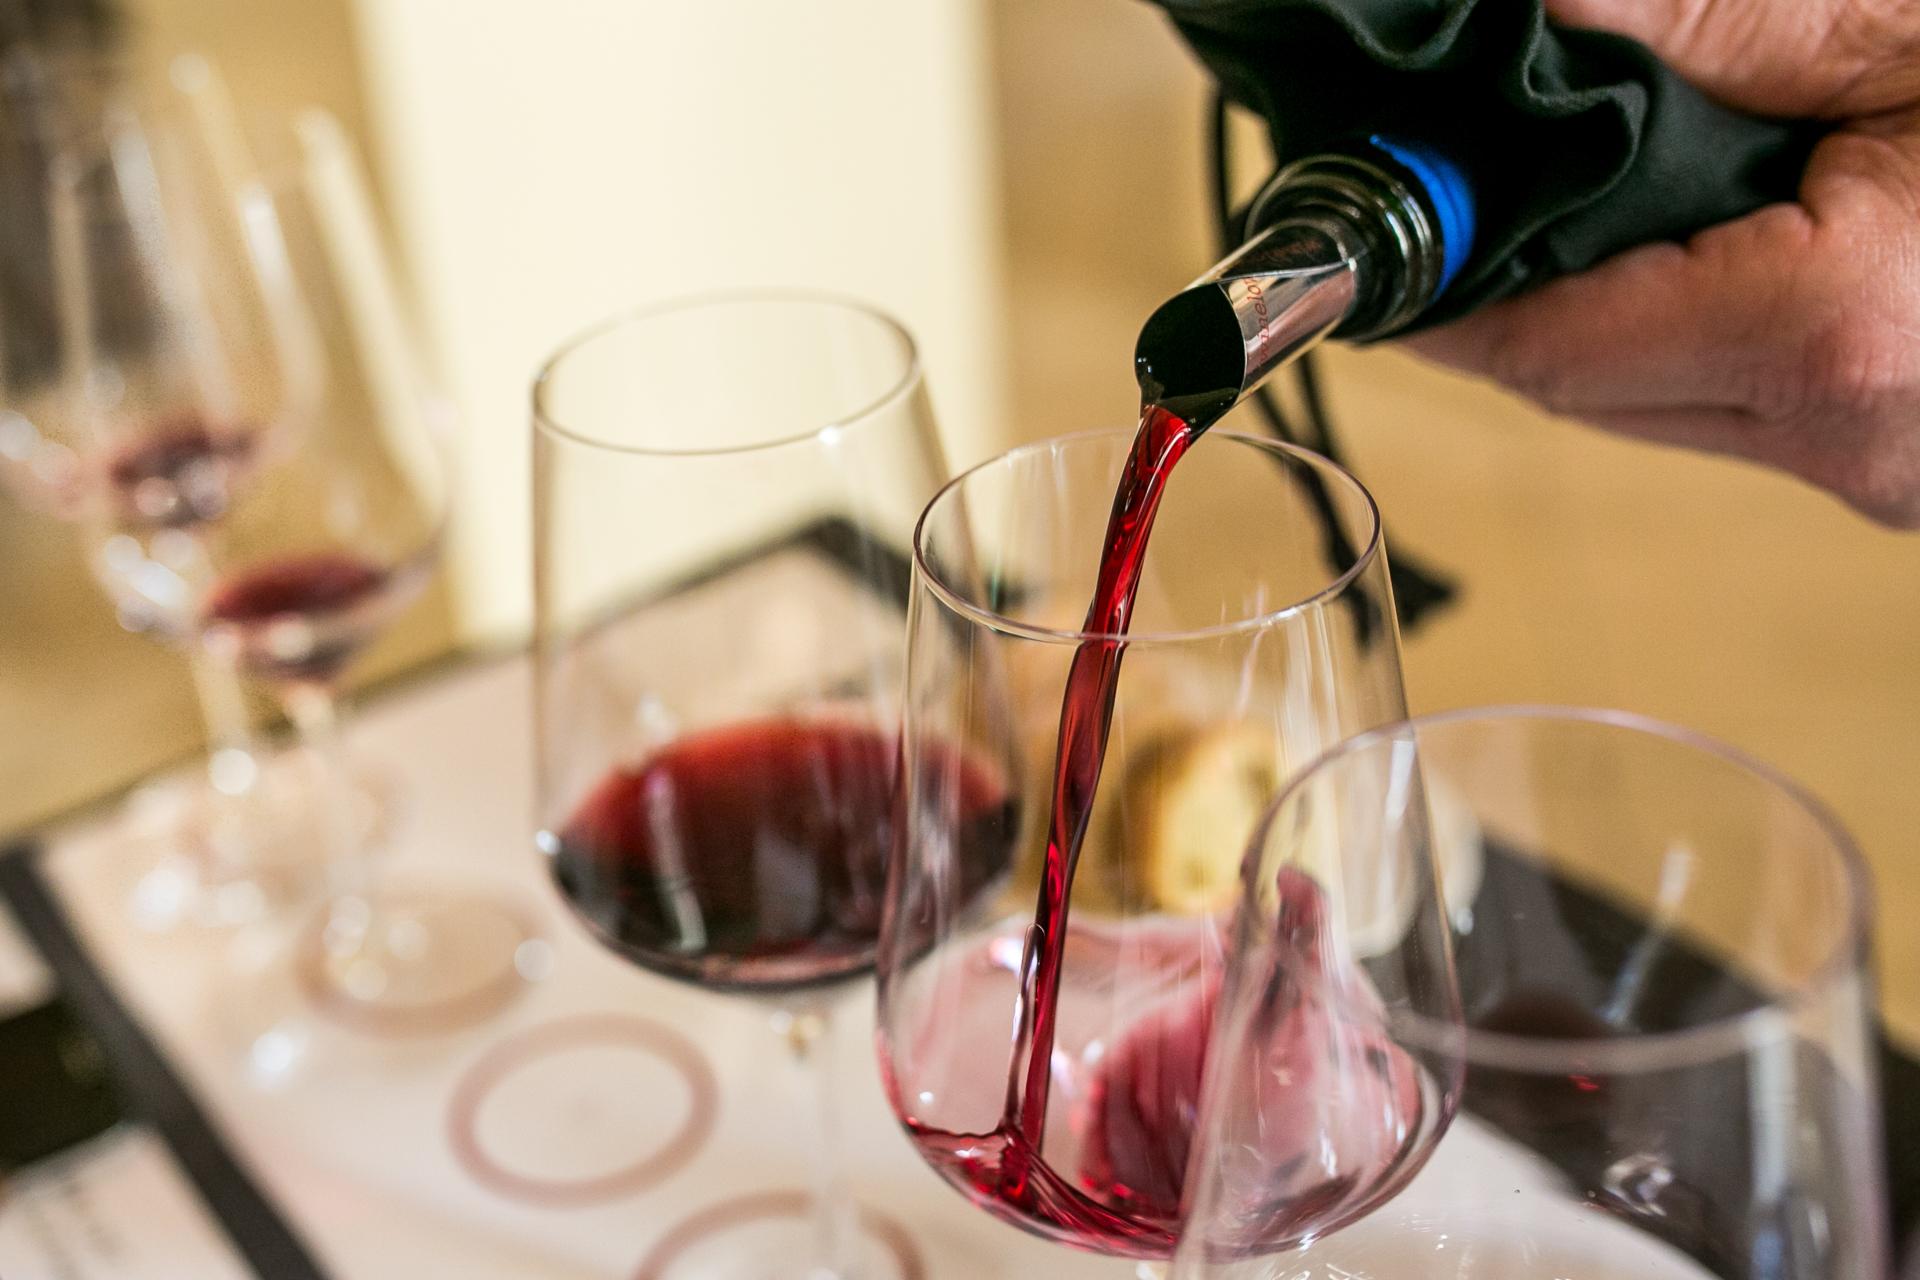 winelovers_aprilisi_borteszt-5569-20170403.jpg